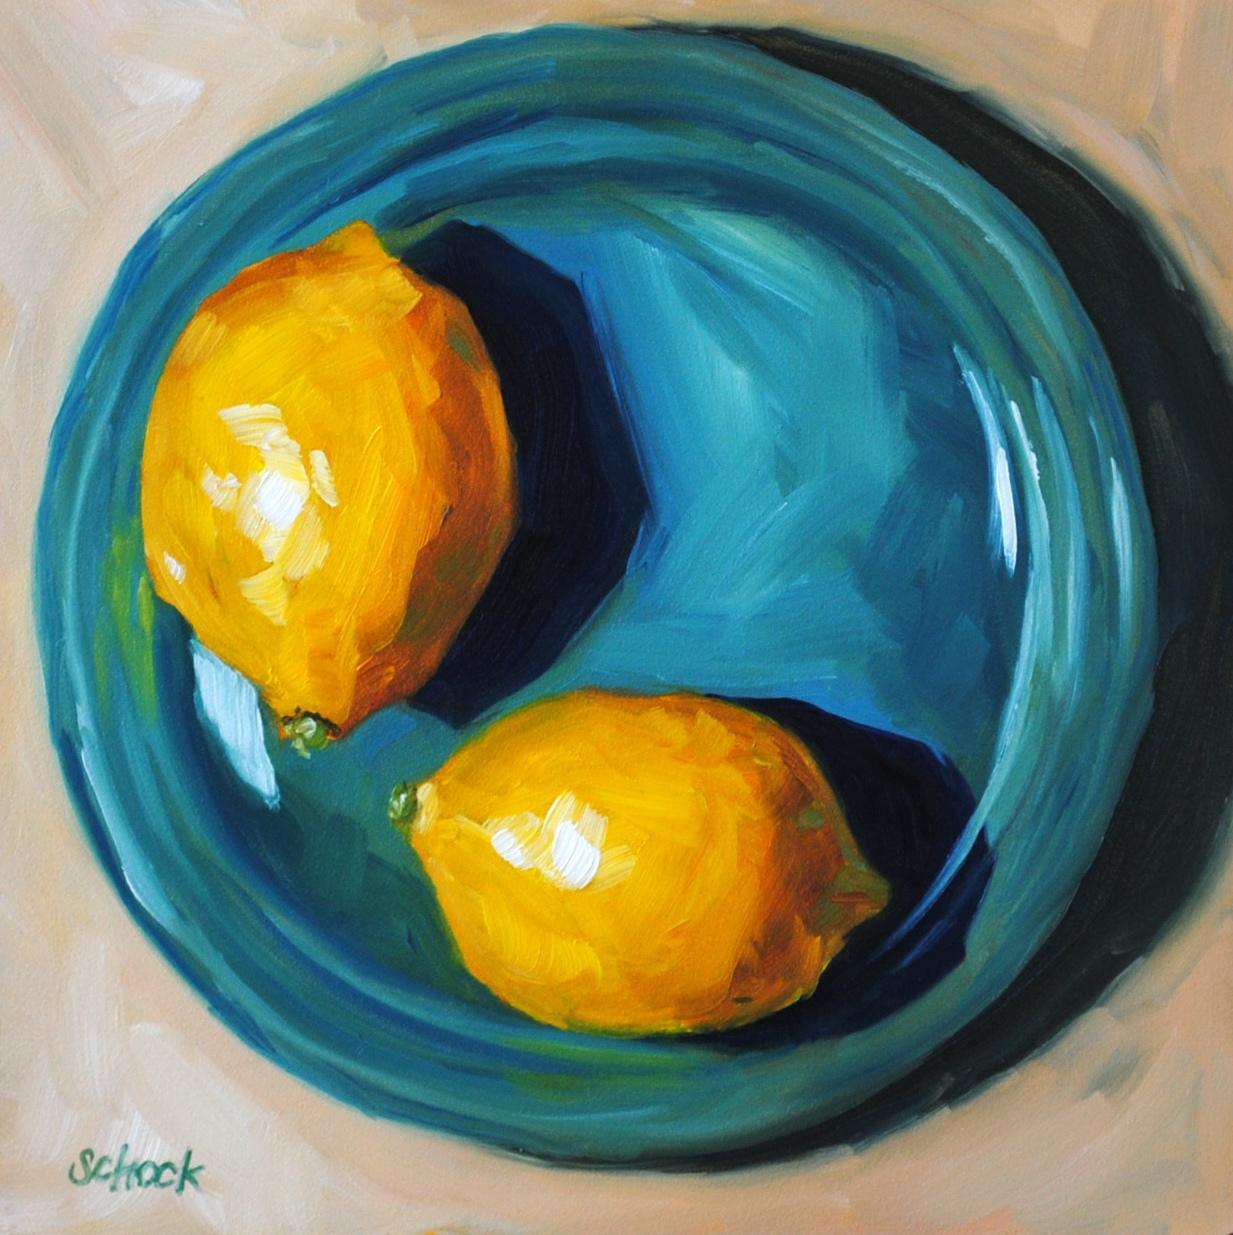 Daily Painters Of Colorado: Yellow on Blue - Lemon Still ...